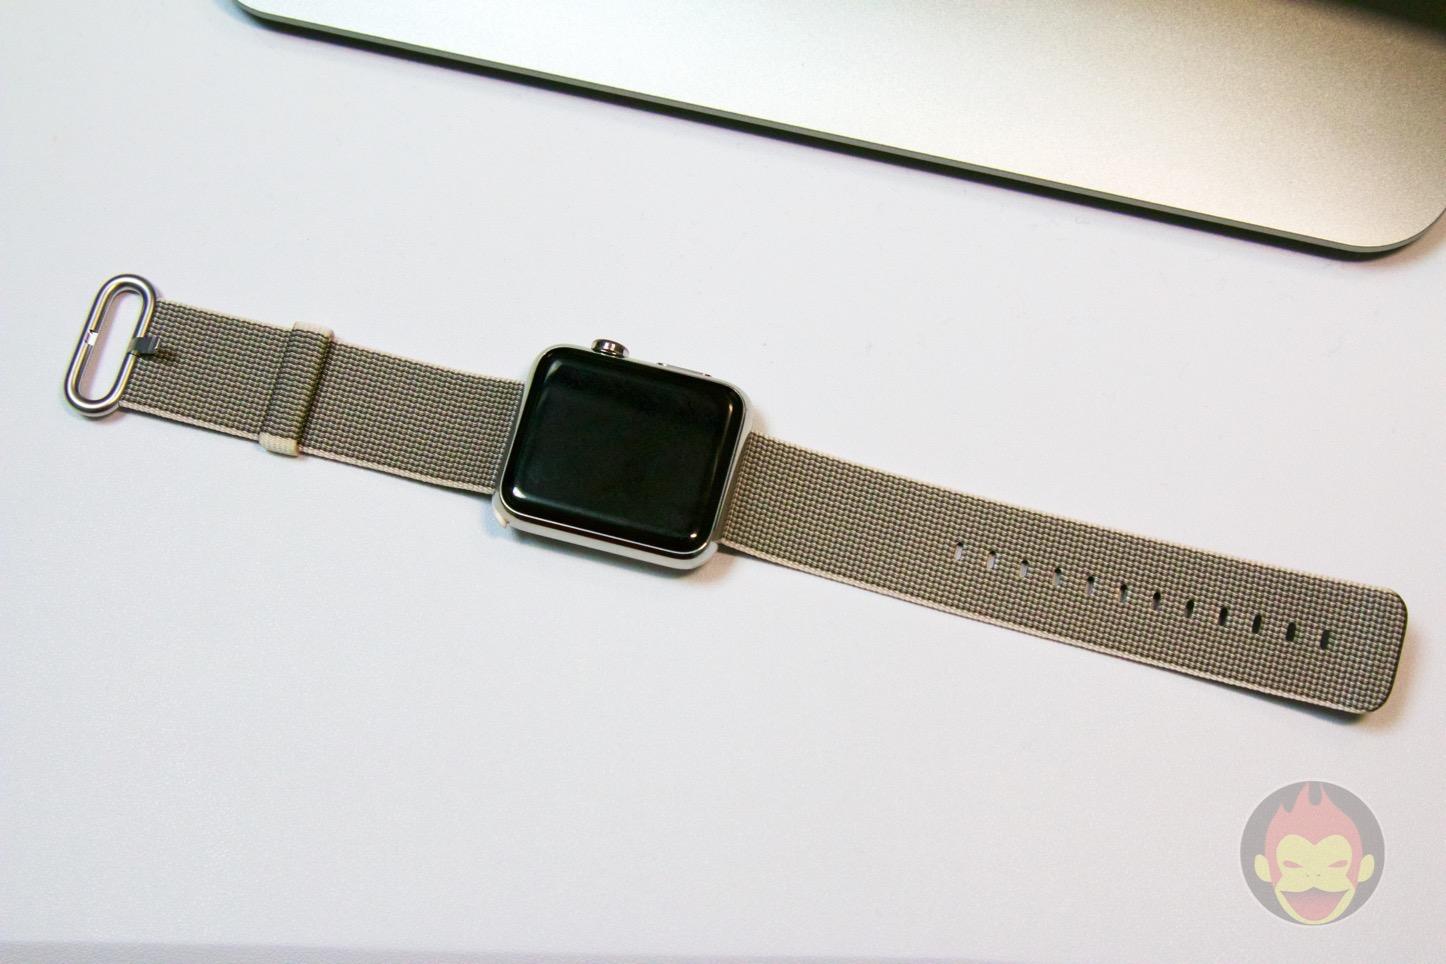 Apple-Watch-Woven-Nylon-Band-08.jpg